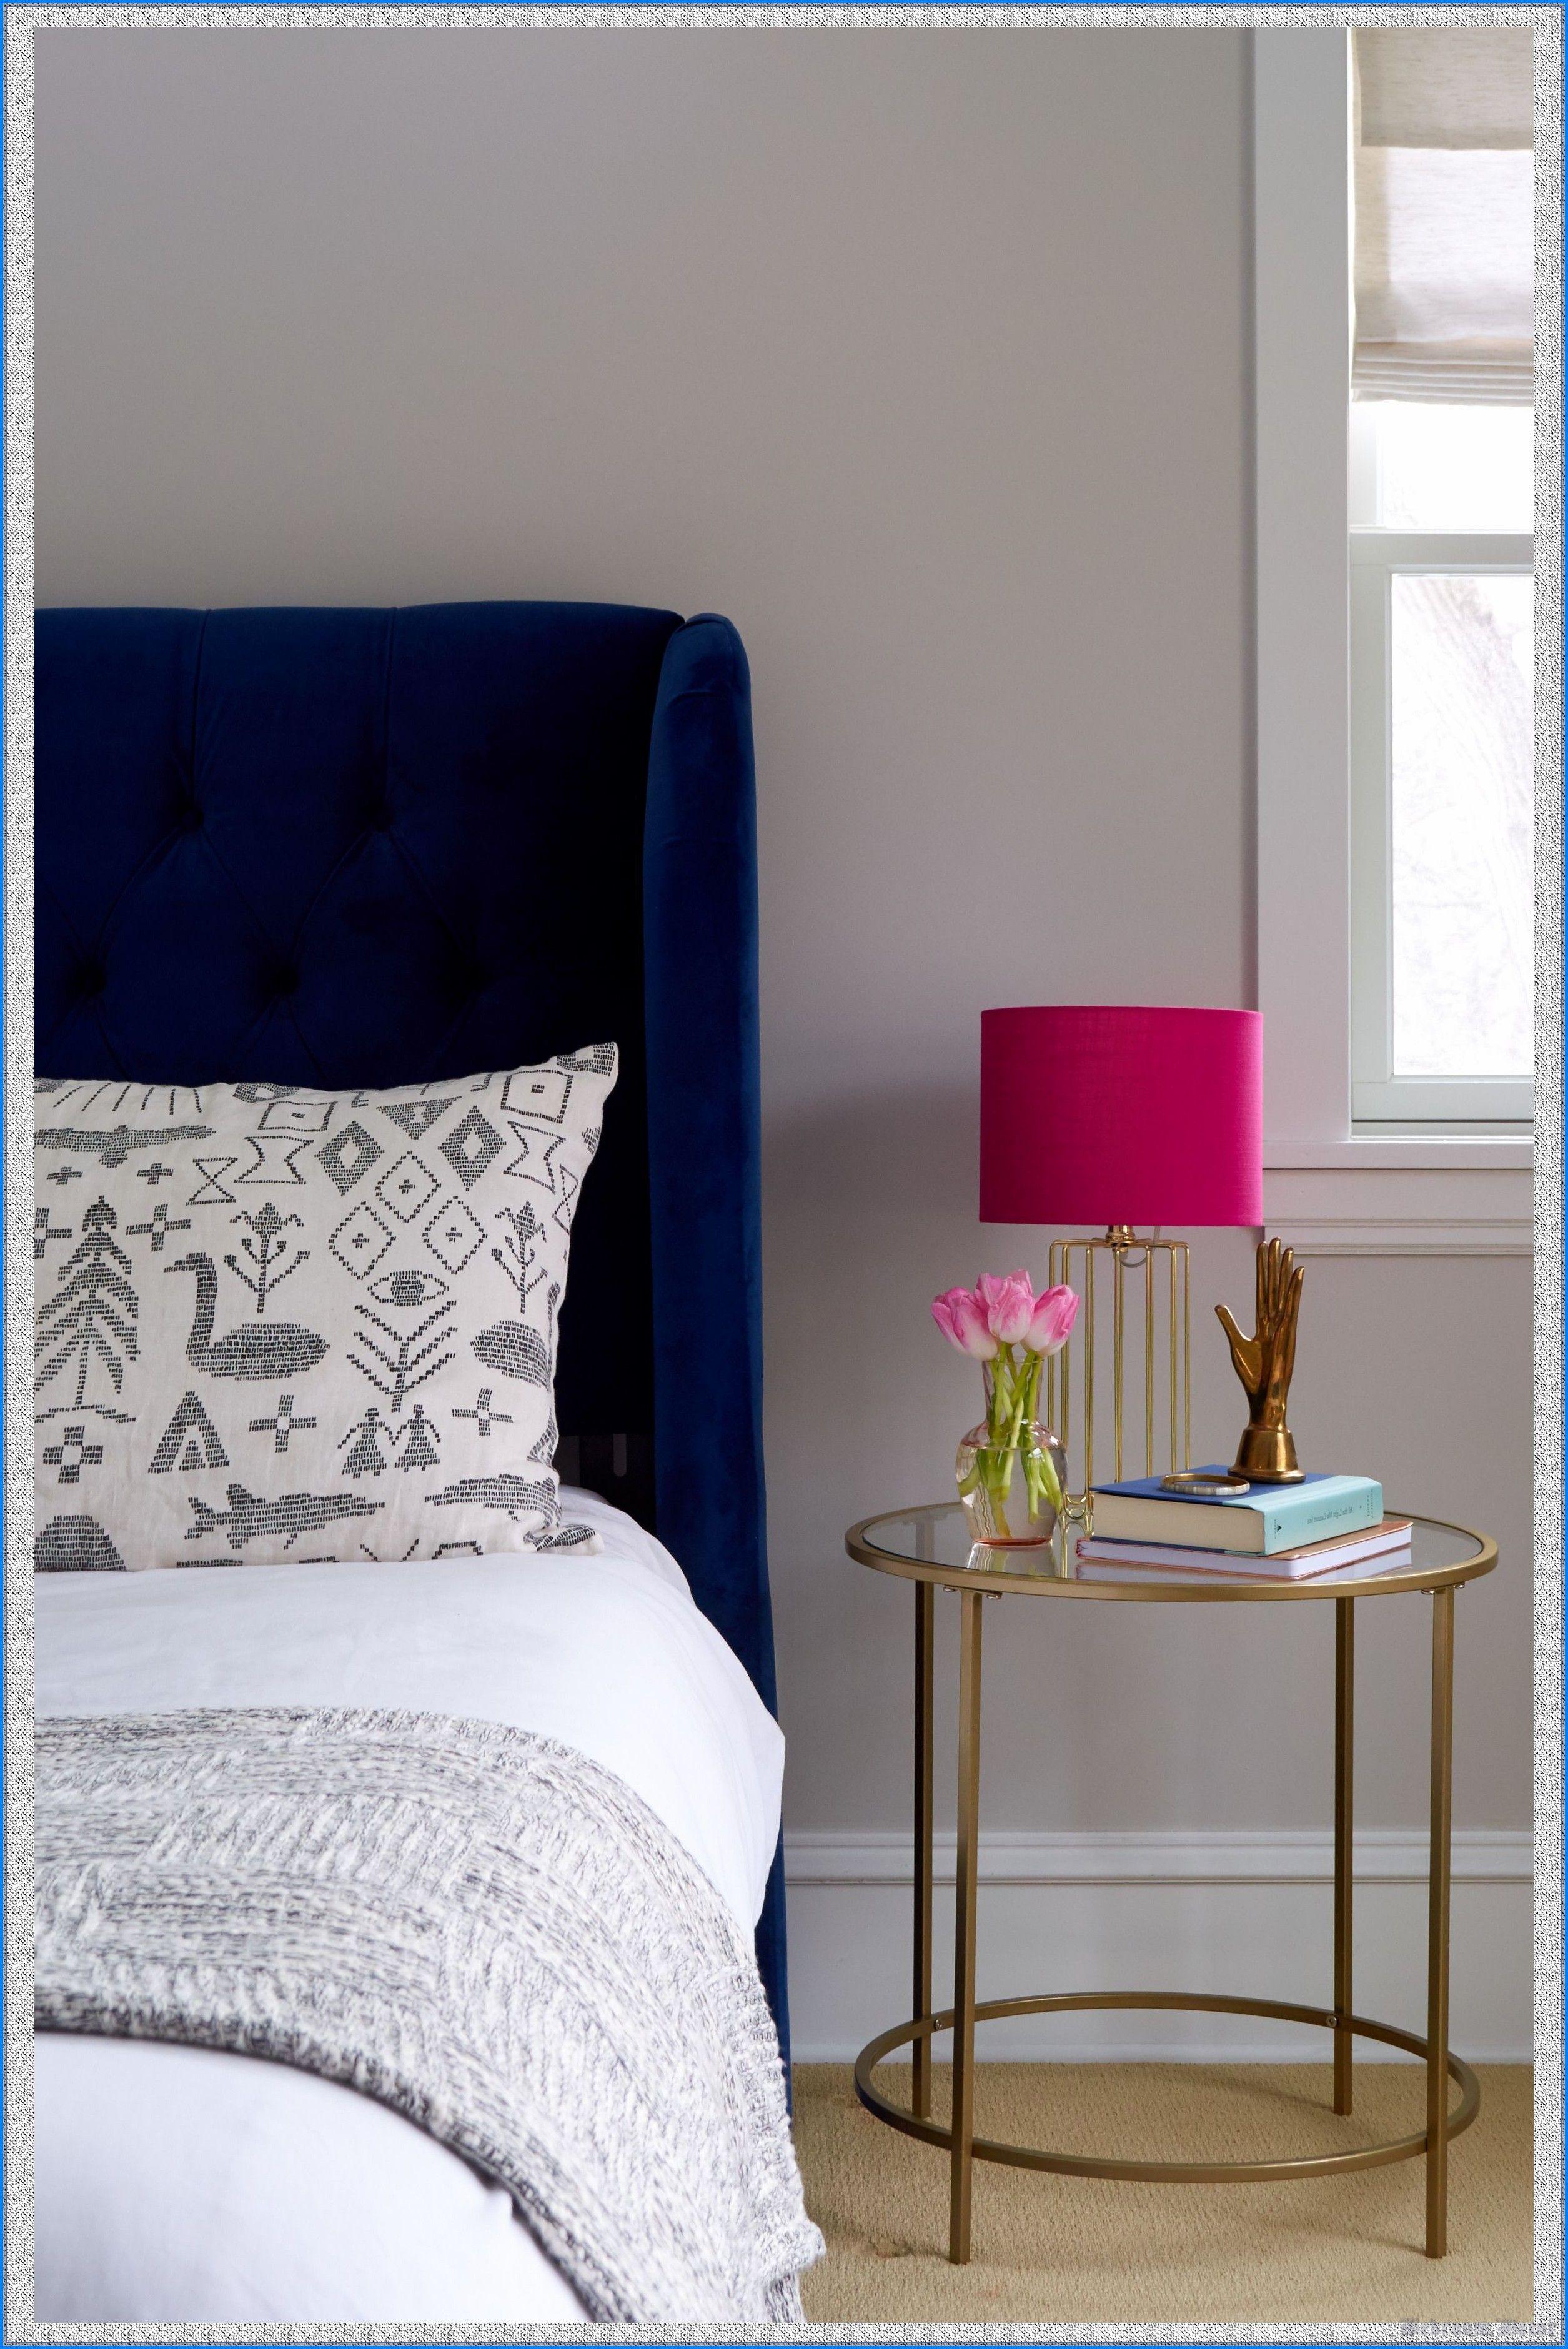 10 Best Practices For Bedroom Decor